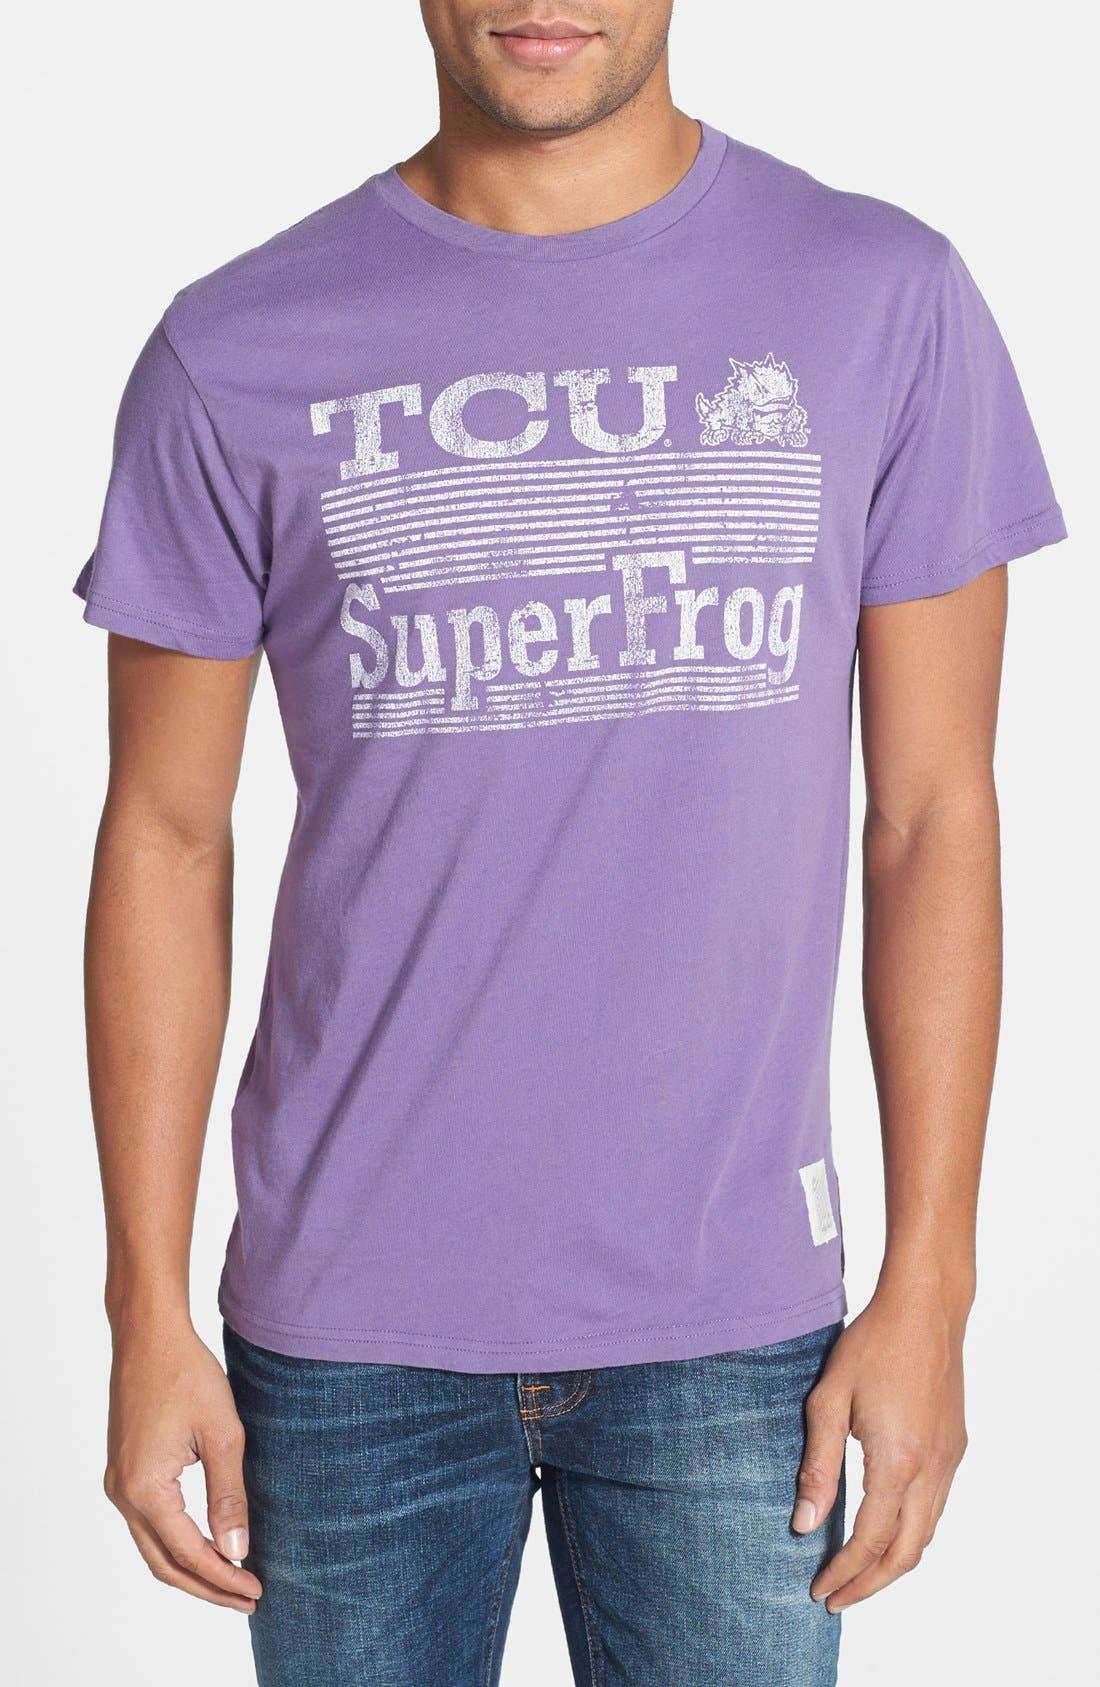 Alternate Image 1 Selected - Retro Brand 'TCU Horned Frogs' Team T-Shirt